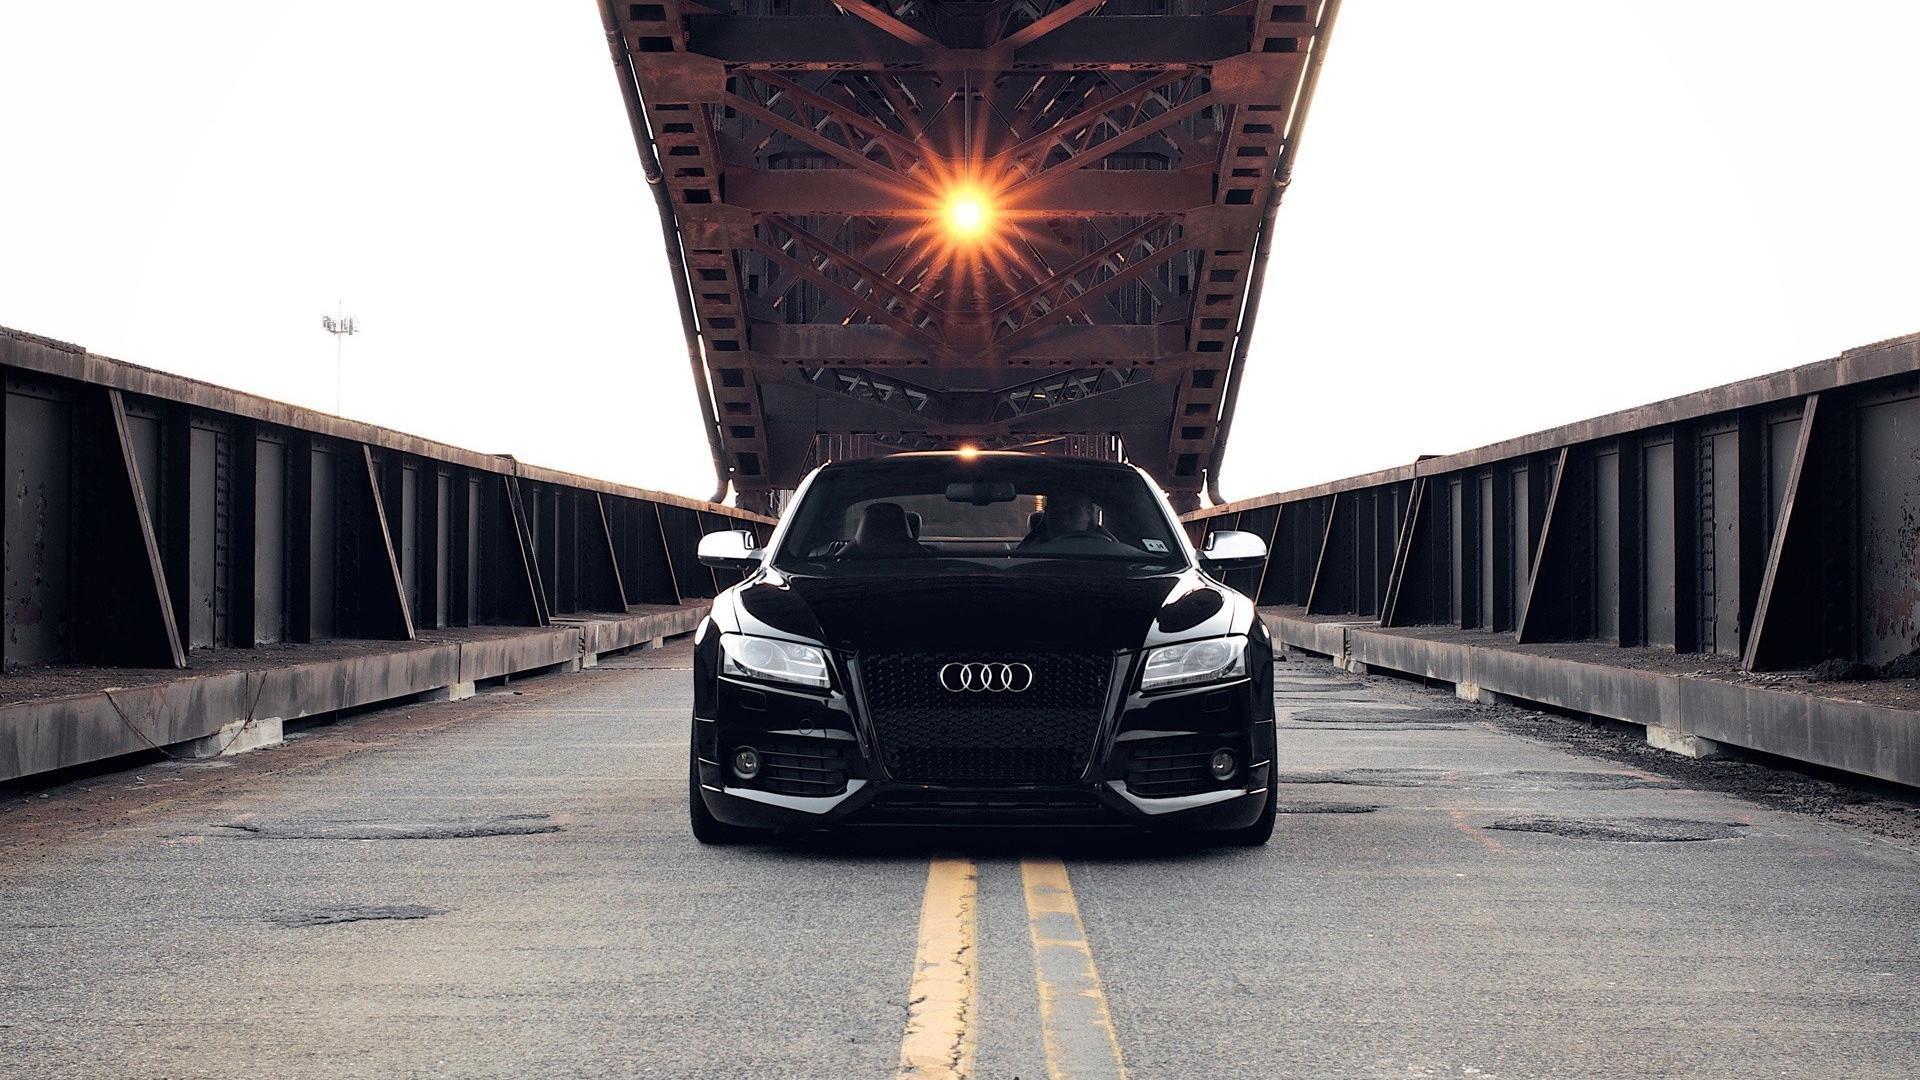 Audi Rs5 Wallpaper 77 Images